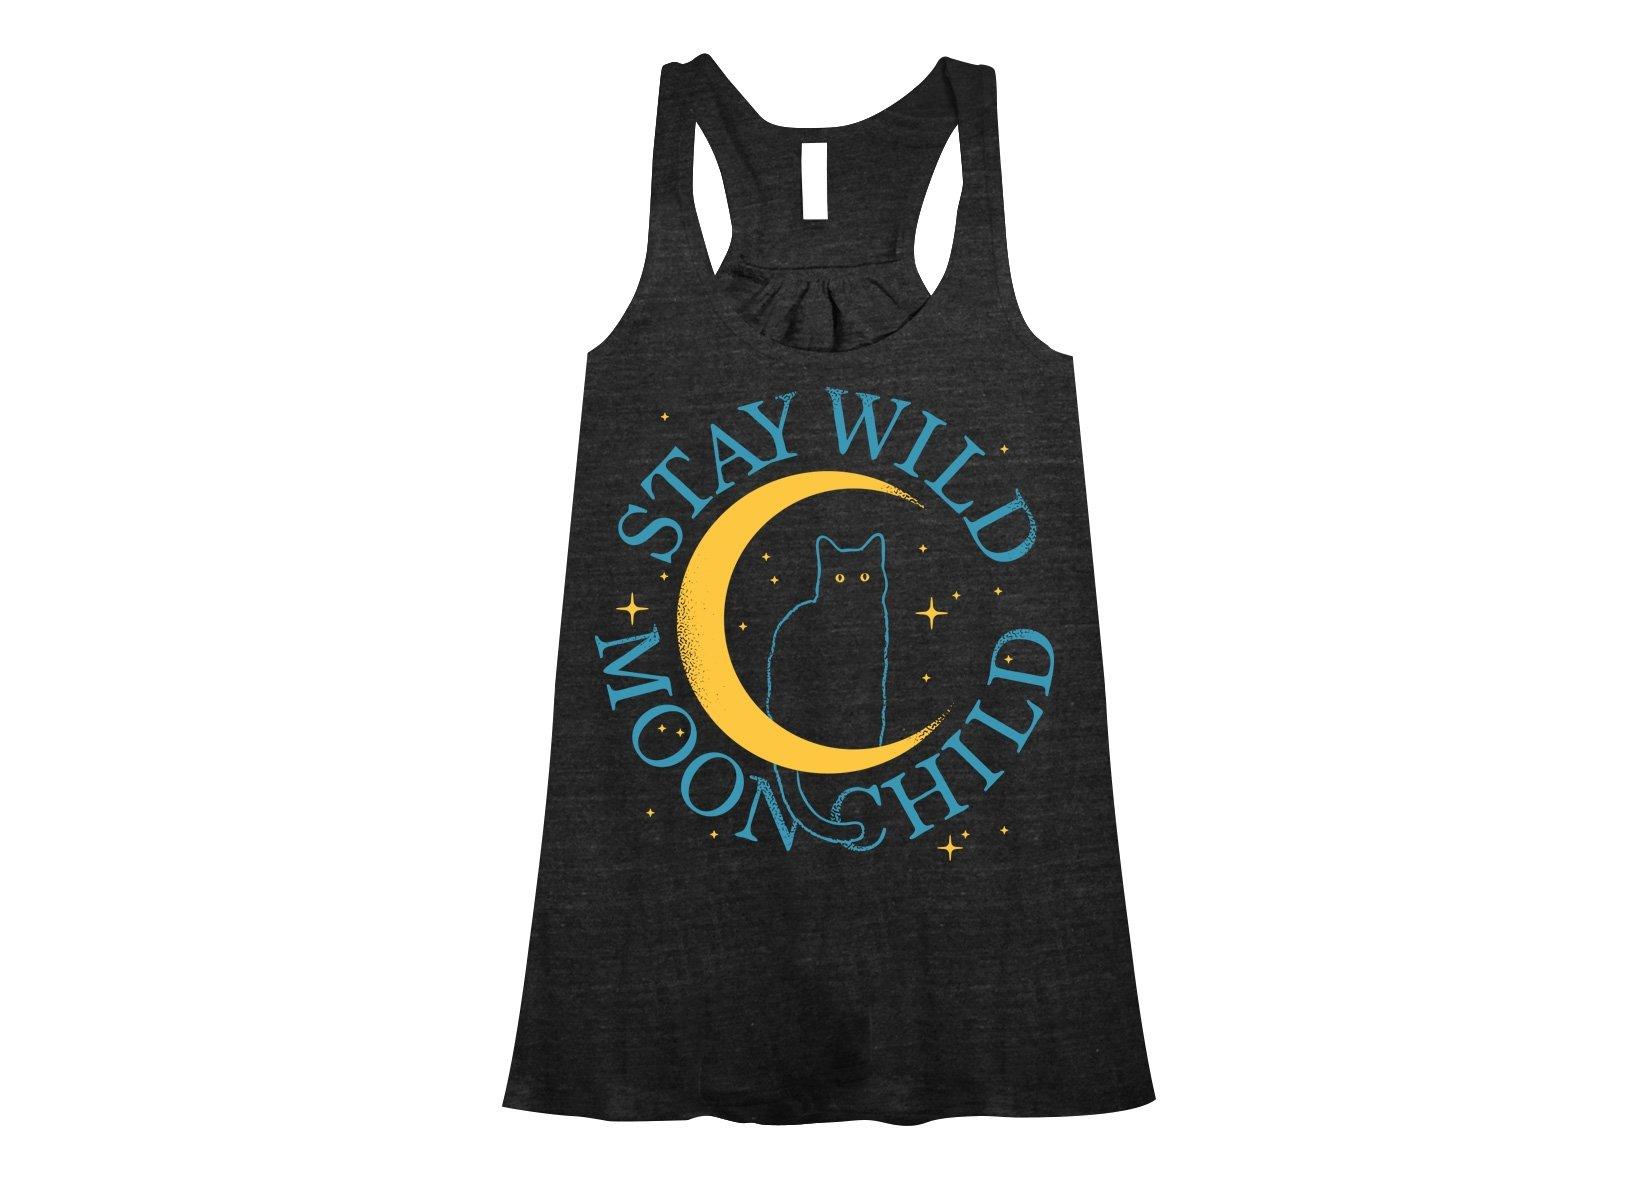 Stay Wild Moon Child on Womens Tanks T-Shirt